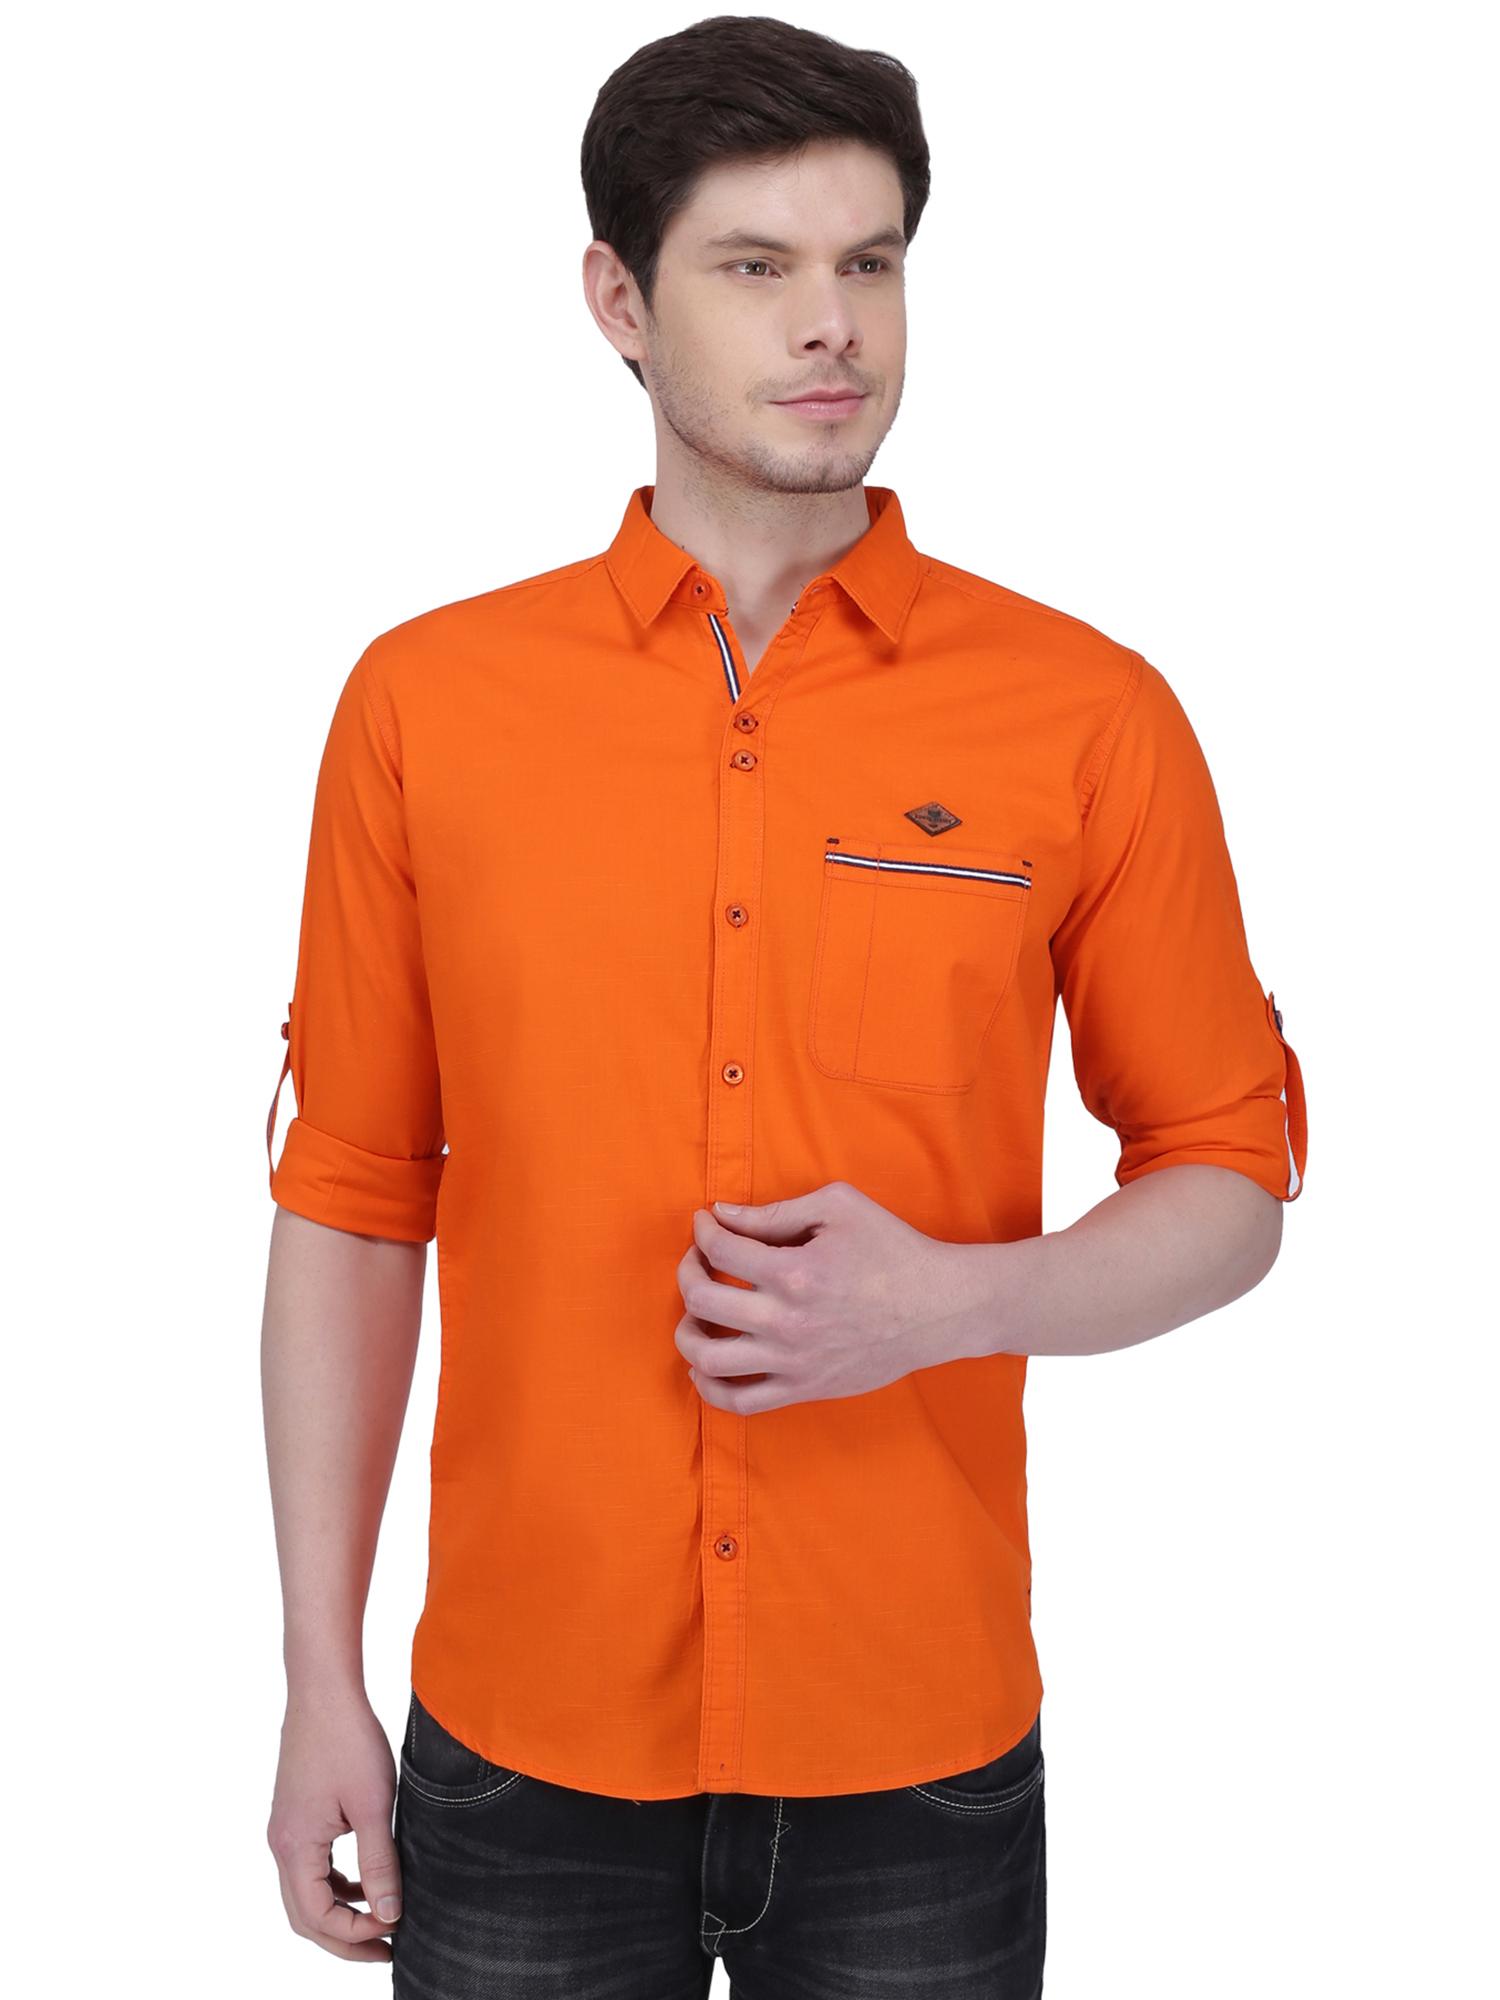 Kuons Avenue   Kuons Avenue Men's Flamboyant Orange Linen Cotton Shirt- KACLFS1308FO